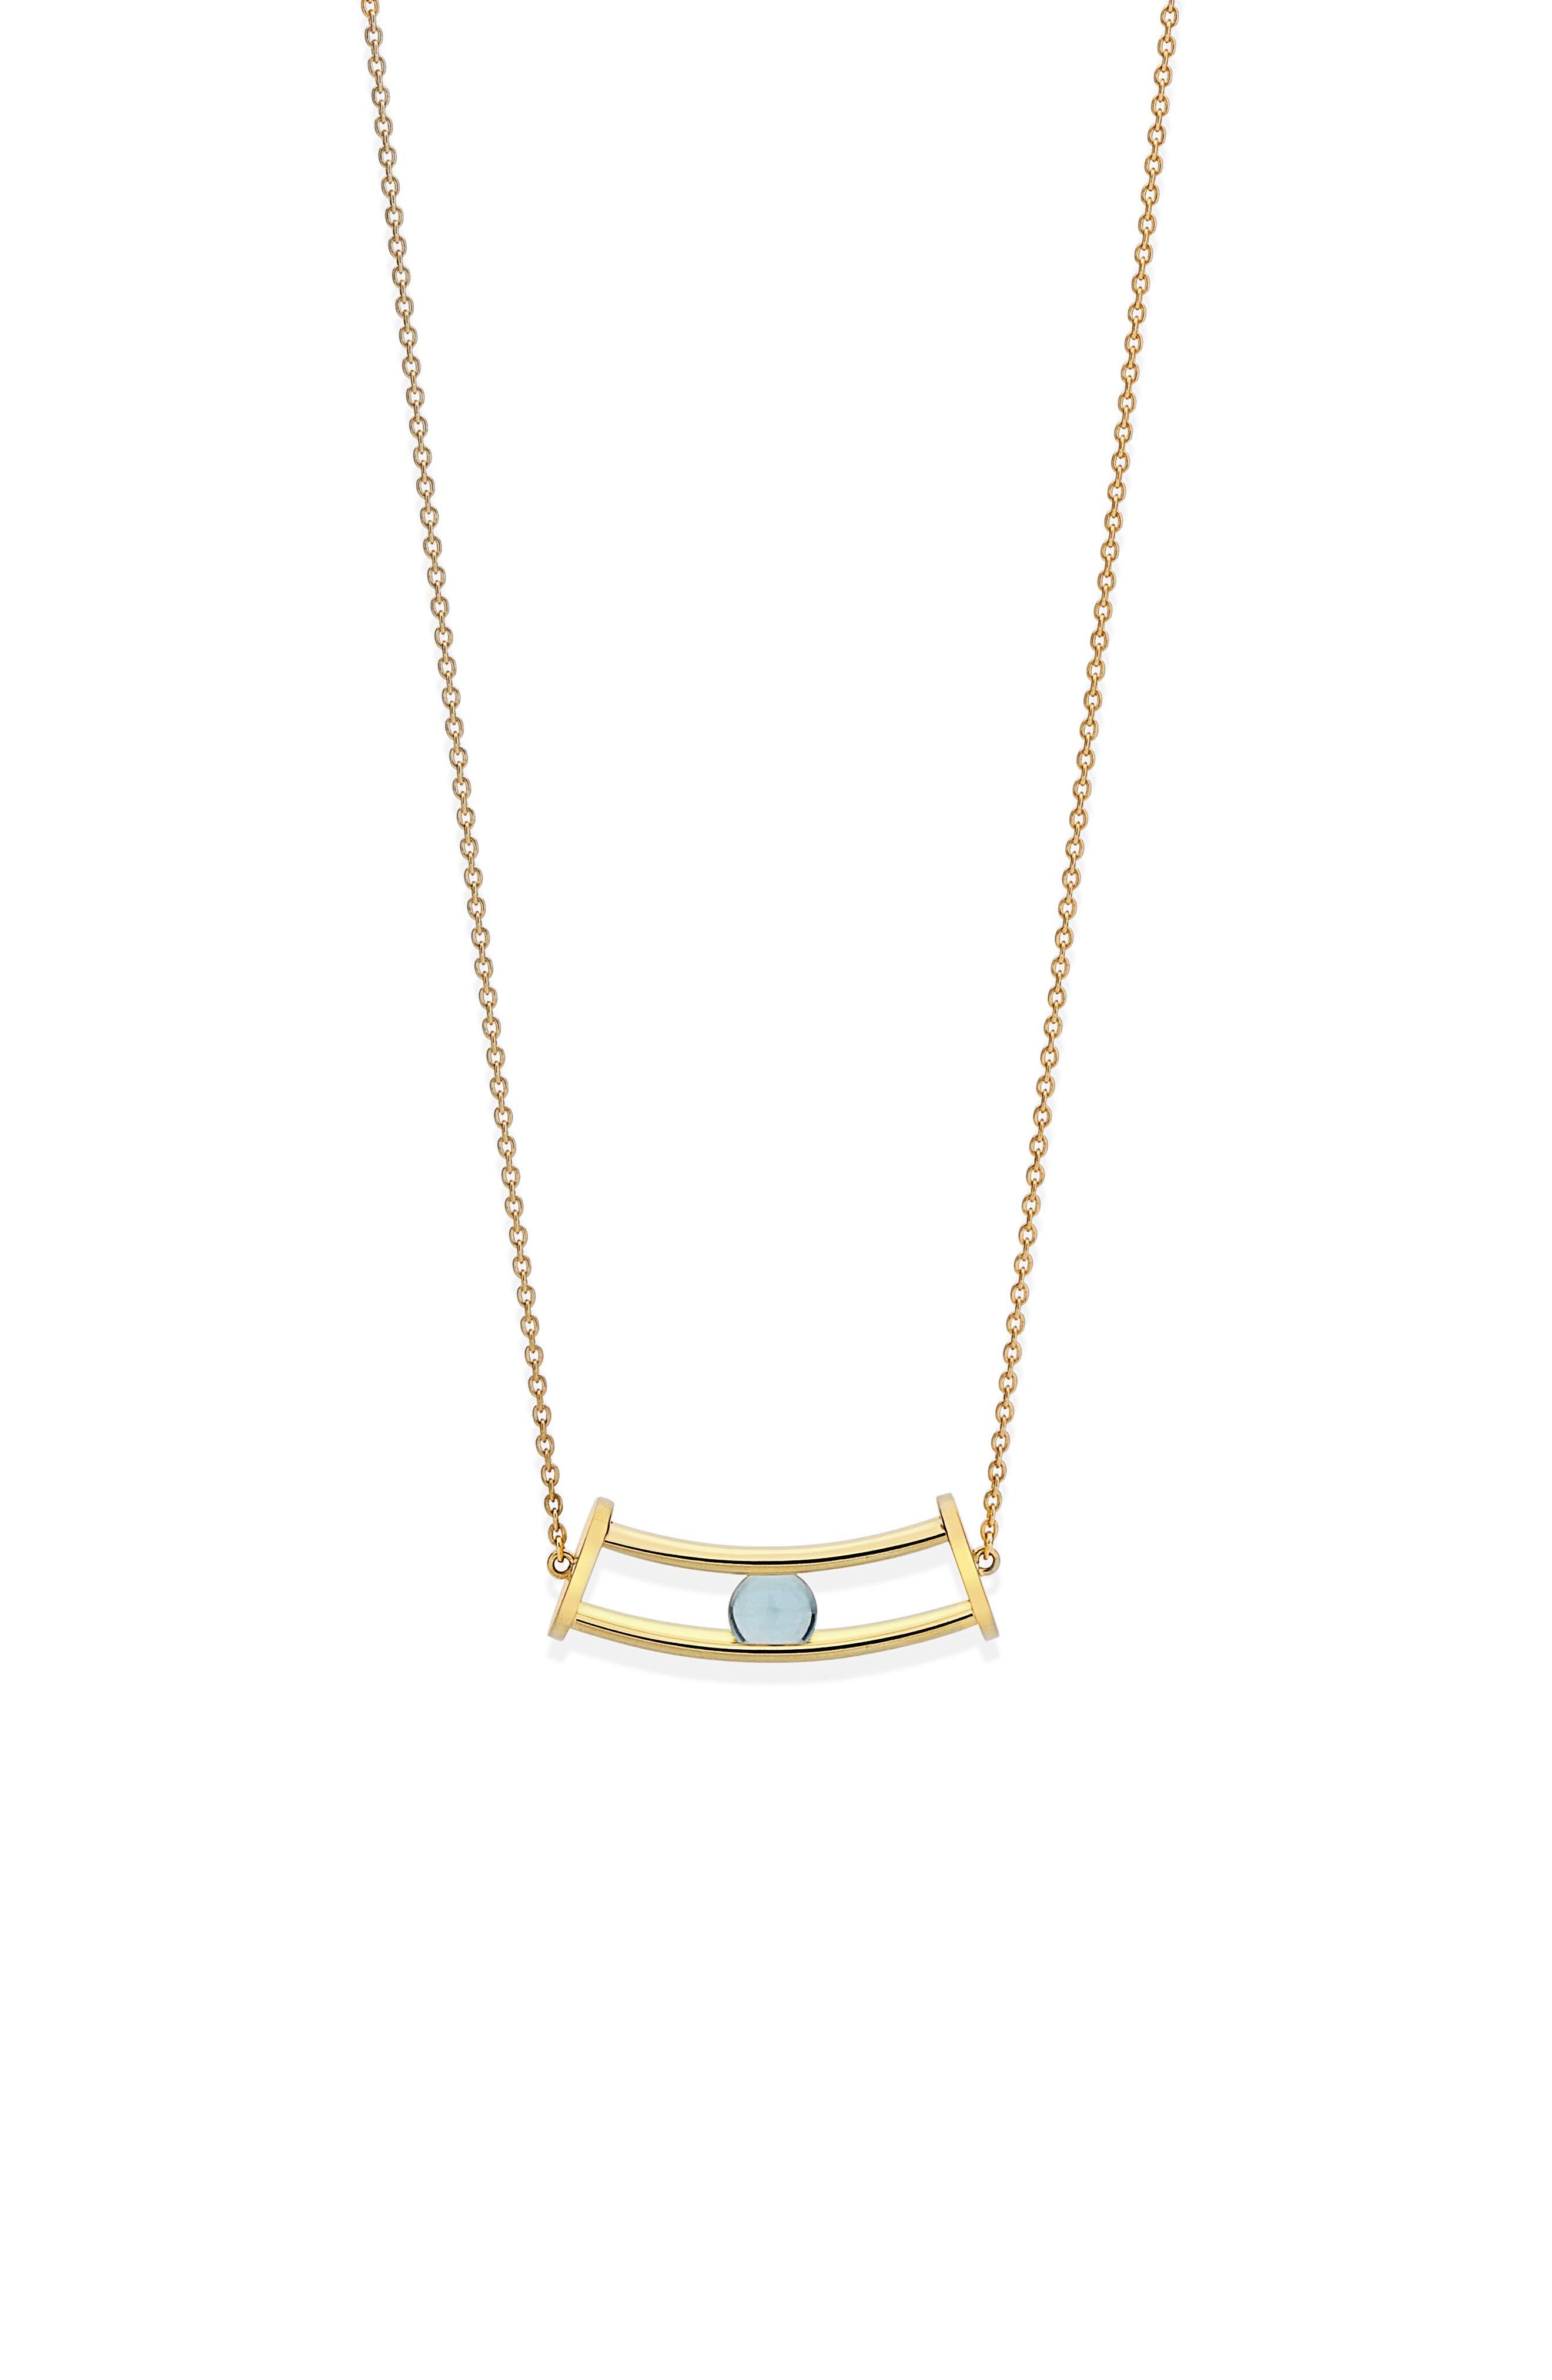 Main Image - Yael Sonia Simple Curve Blue Topaz Pendant Necklace